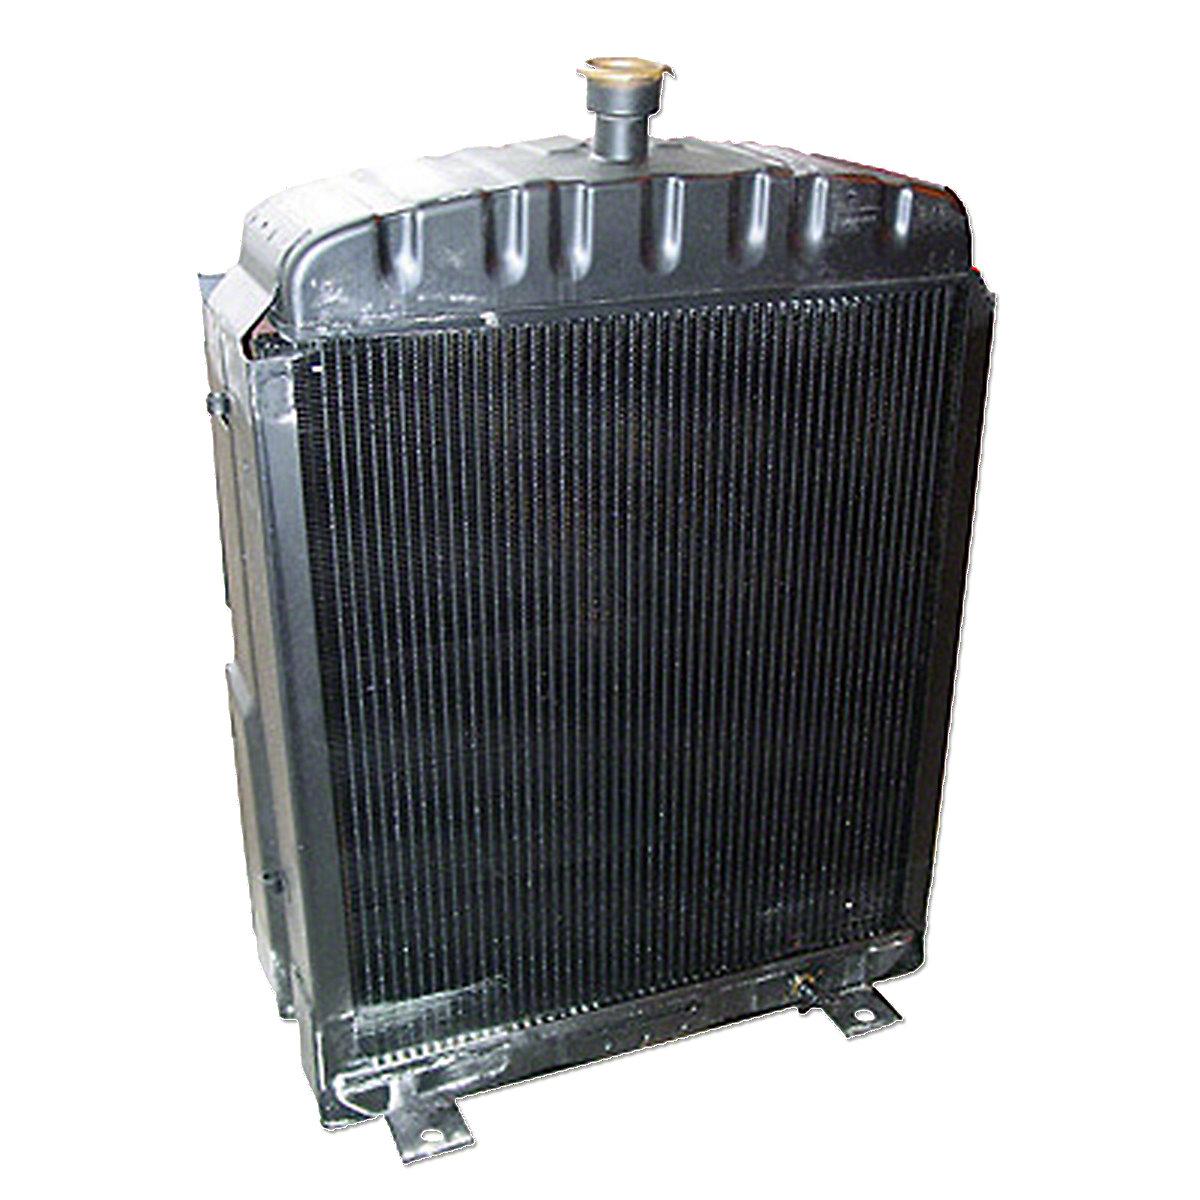 Radiator For Allis Chalmers: D17 Gas Models